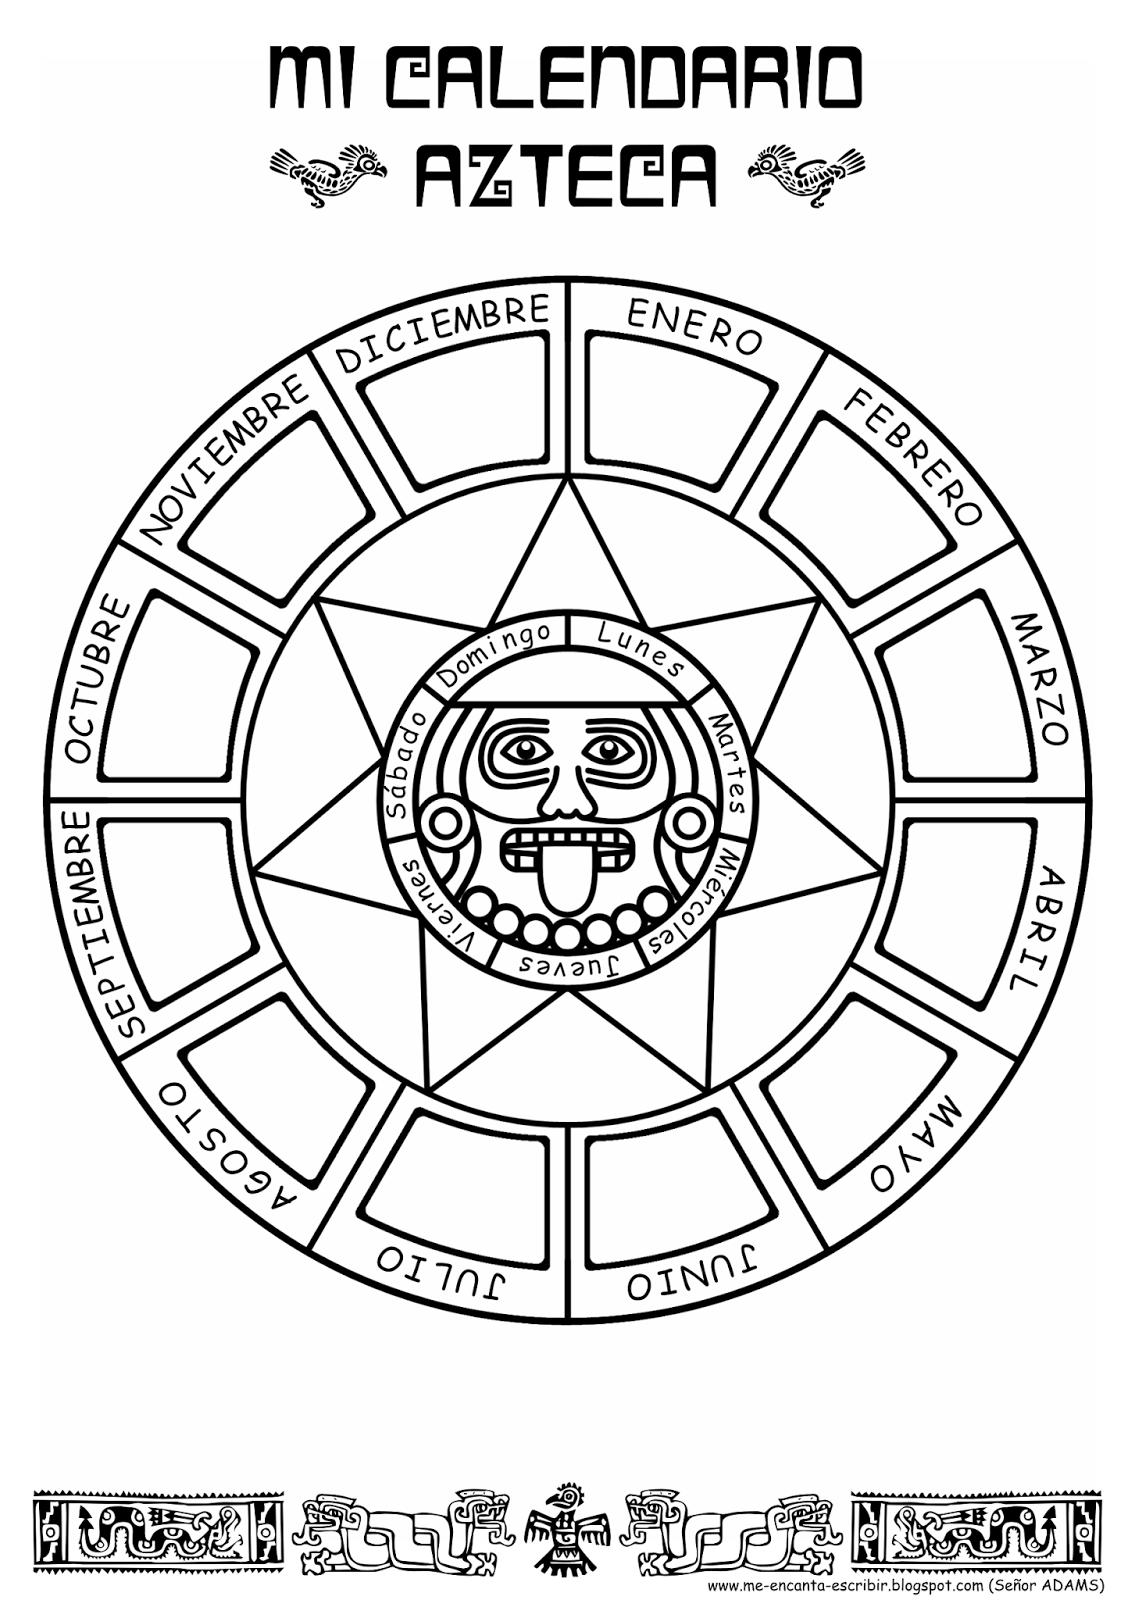 Me encanta escribir en español: Mi calendario Azteca